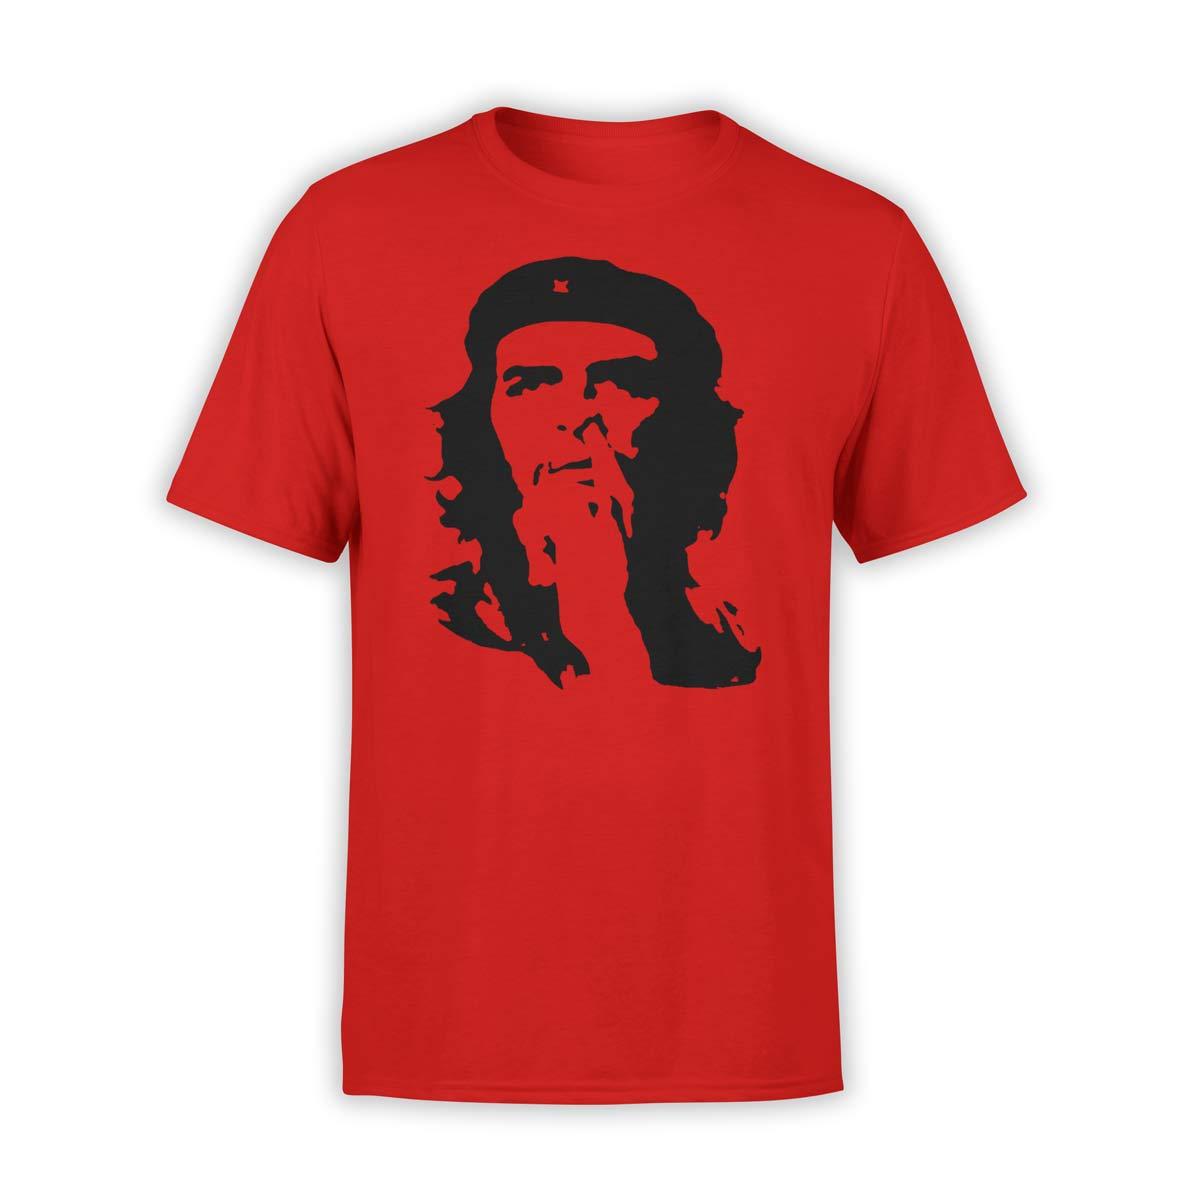 Che guevara t shirt quotche guevara nose pickingquot unisex for Che guevara t shirt